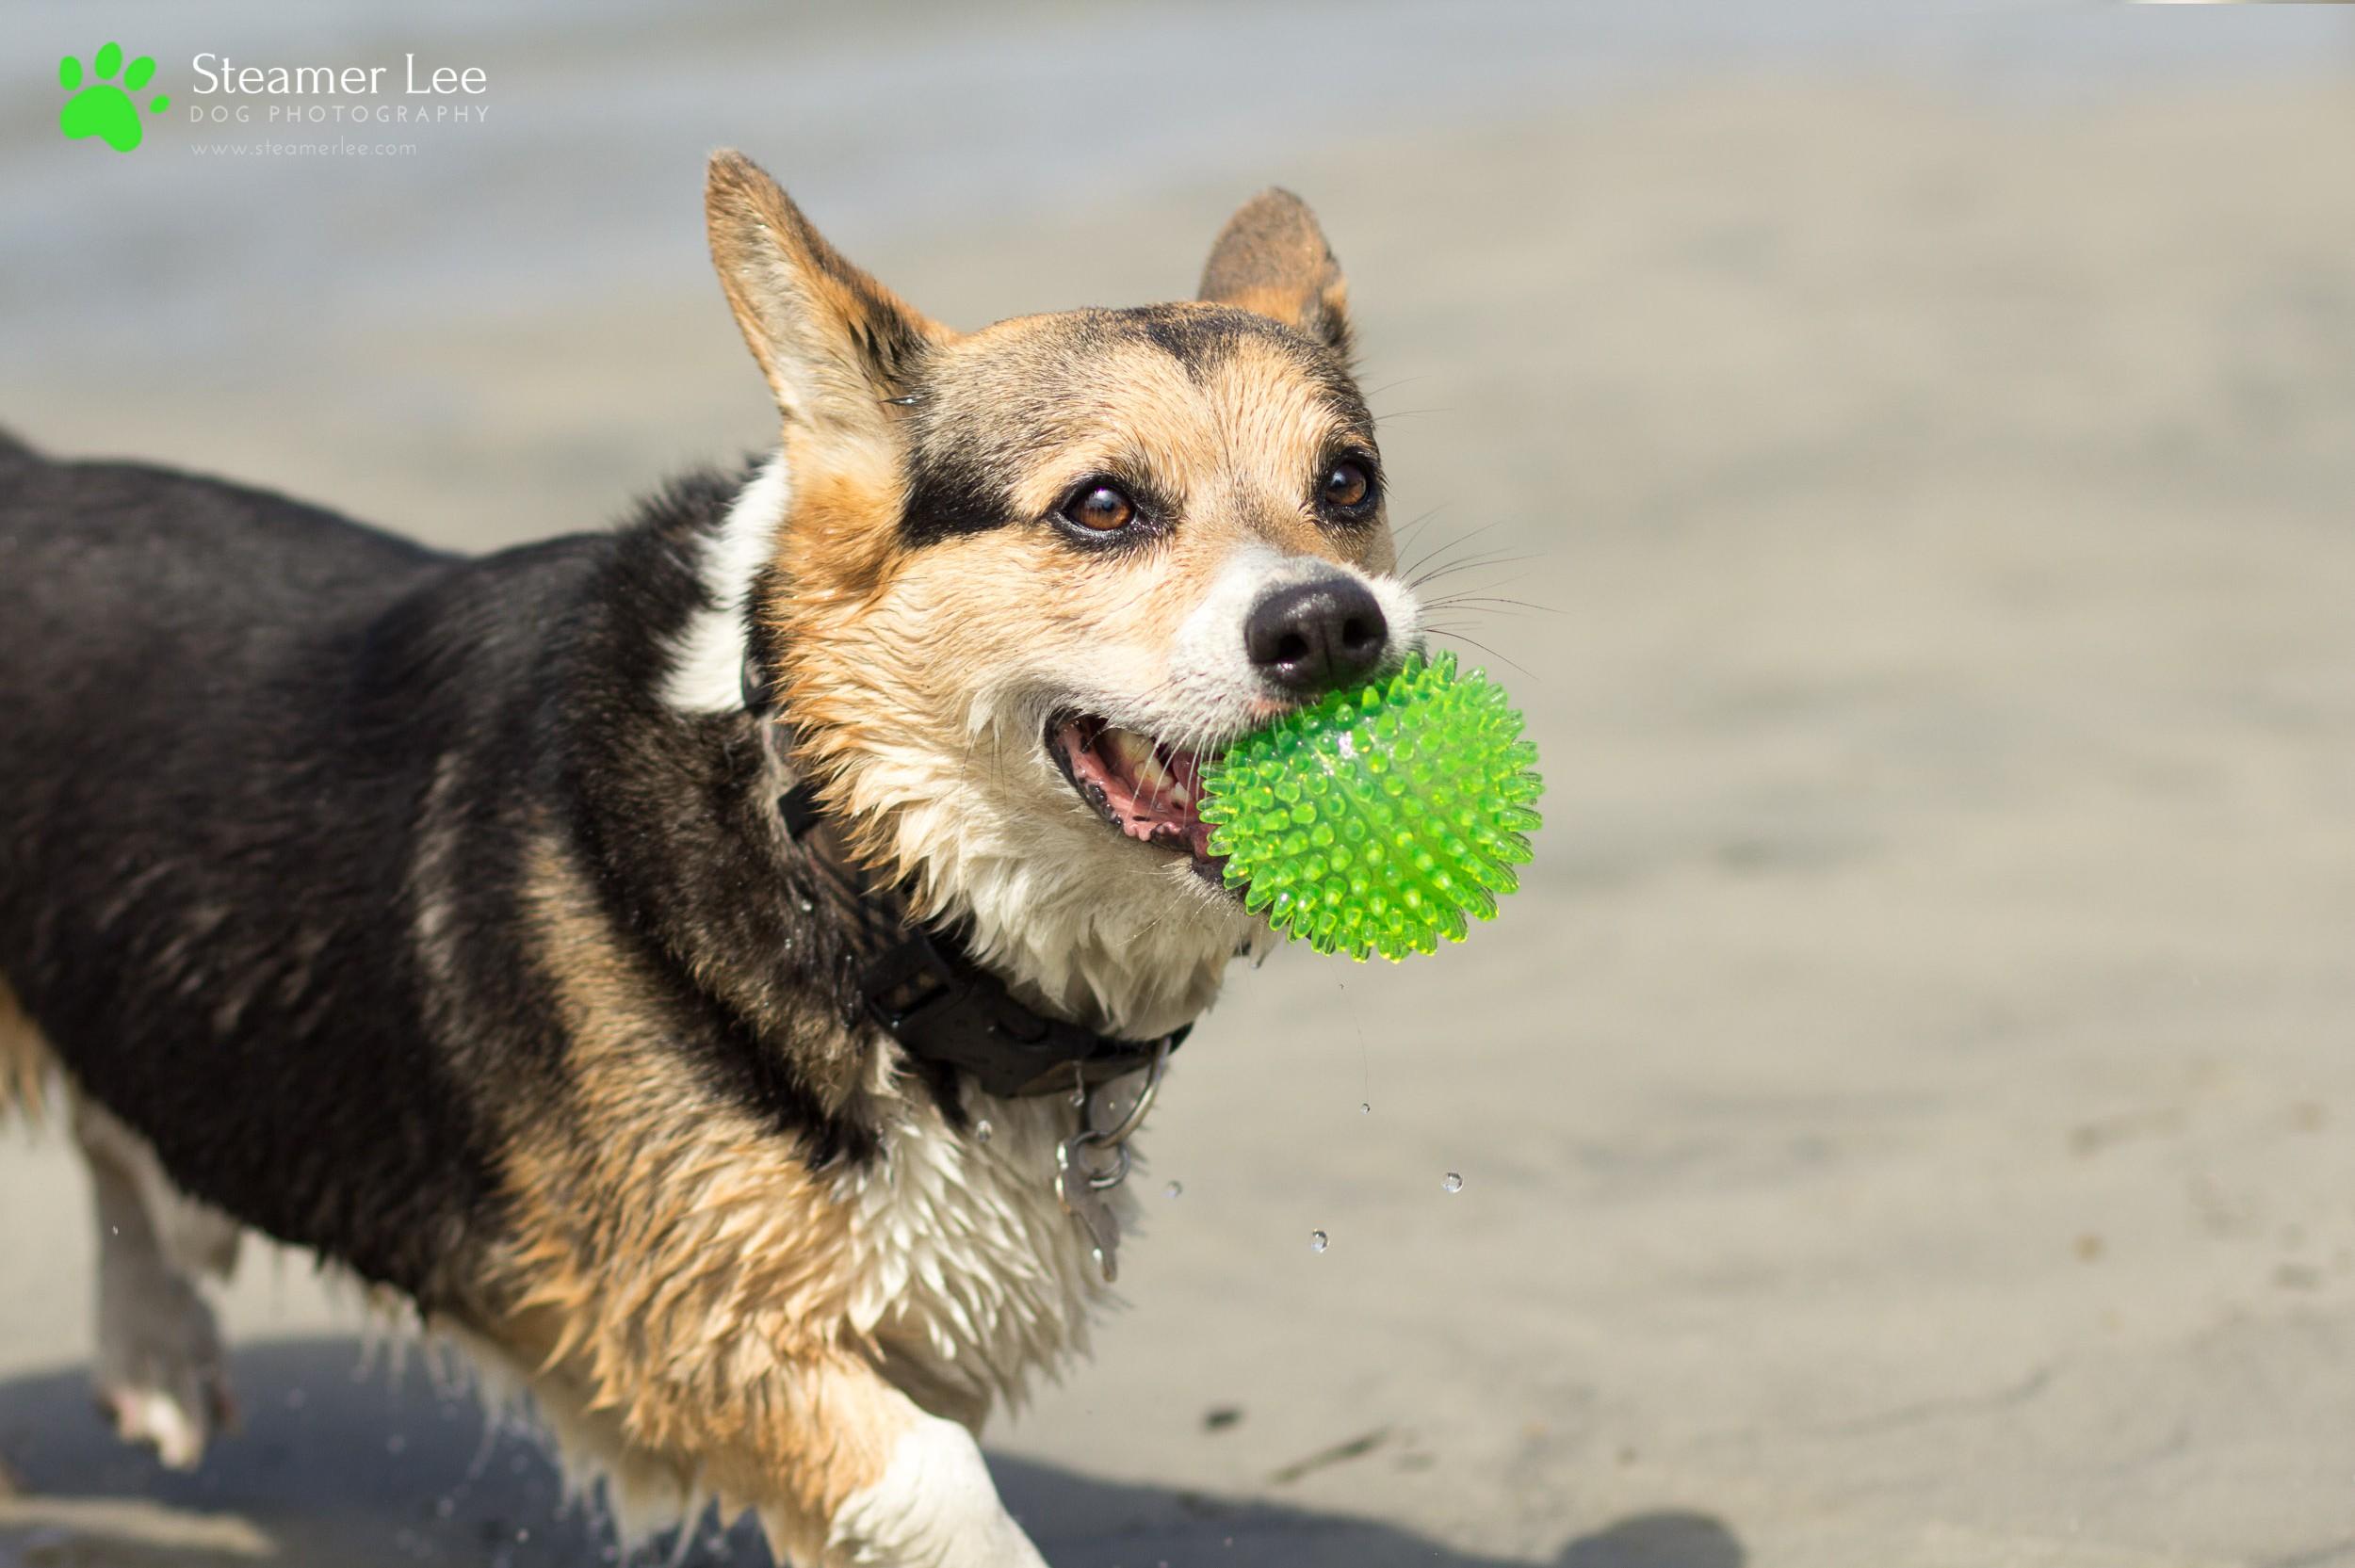 Steamer Lee Dog Photography - July 2017 So Cal Corgi Beach Day - Vol. 3 - 16.jpg